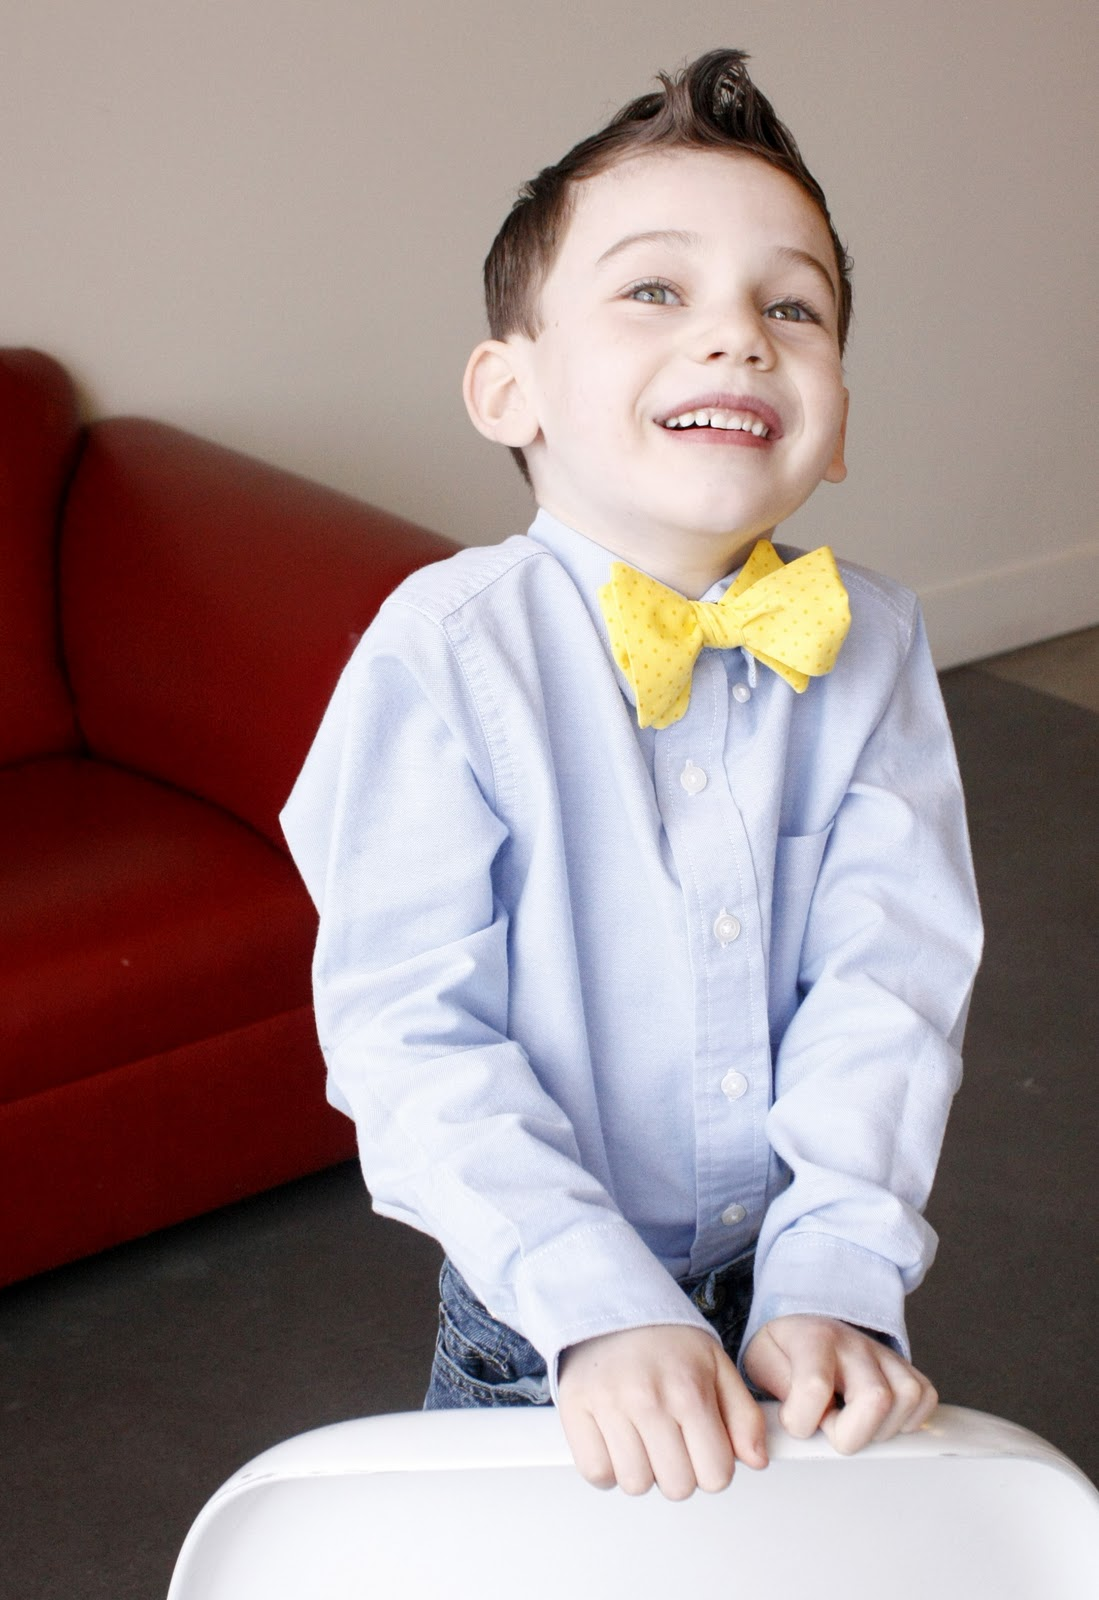 Boys Quality Bow Ties Boys Check Bow Tie Kids Polka Dot ...  |Bow Ties For Boys